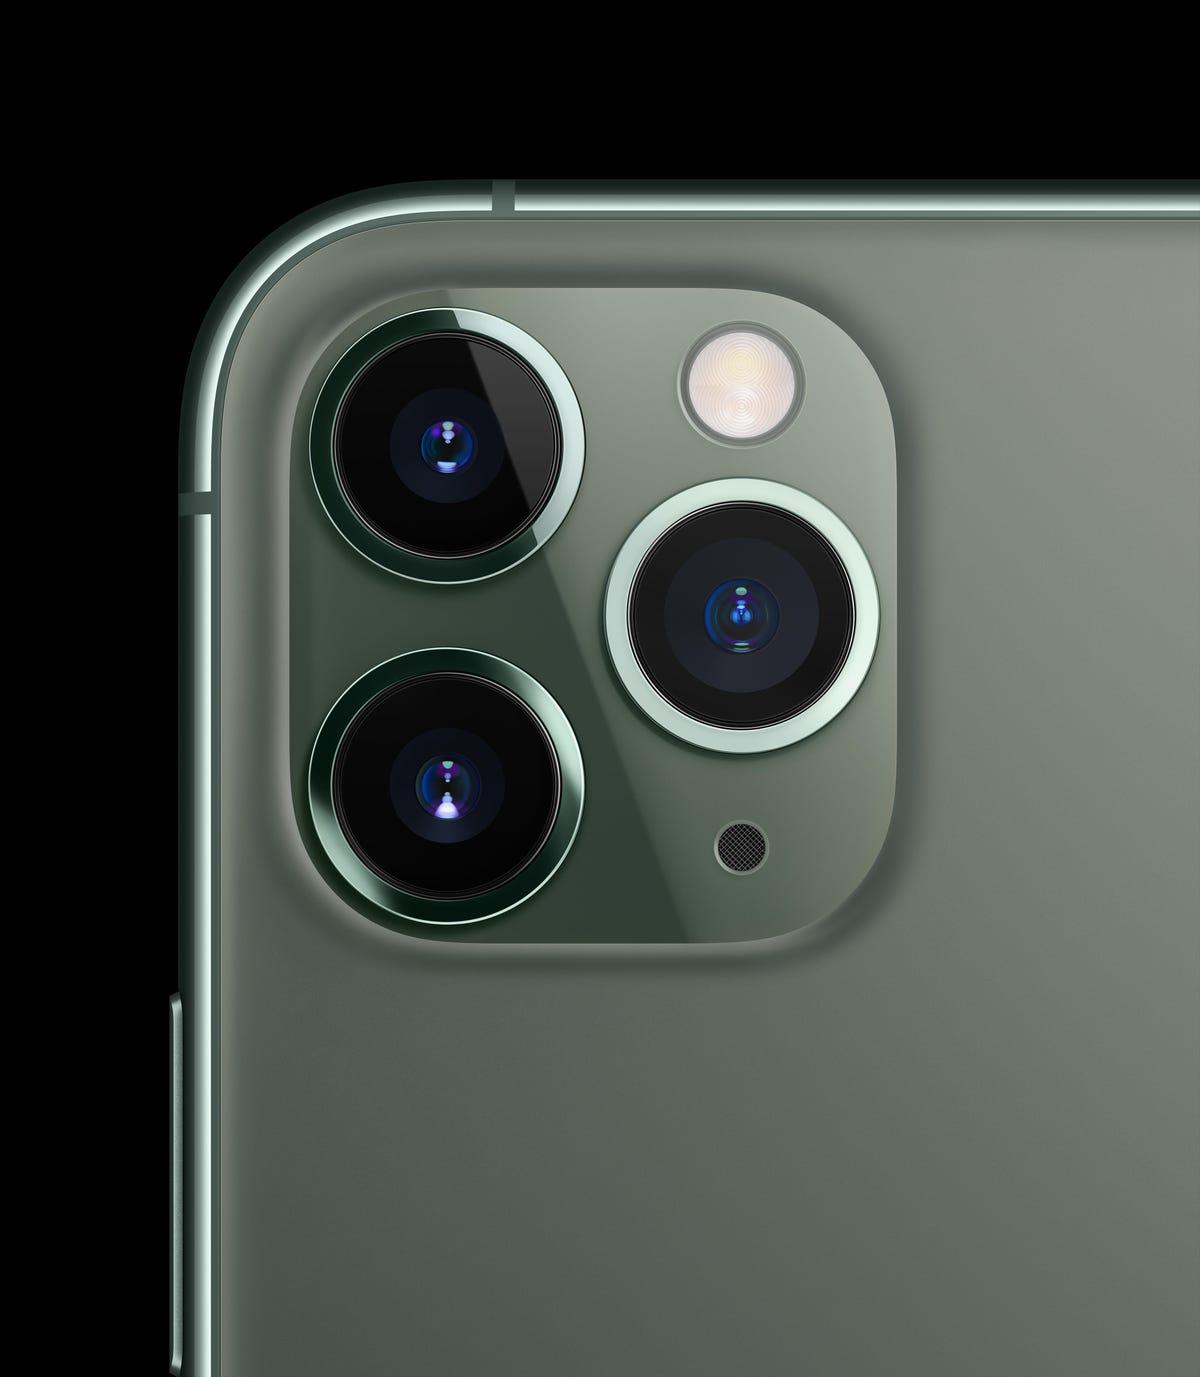 apple-iphone-11-pro-most-powerful-advanced-091019.jpg